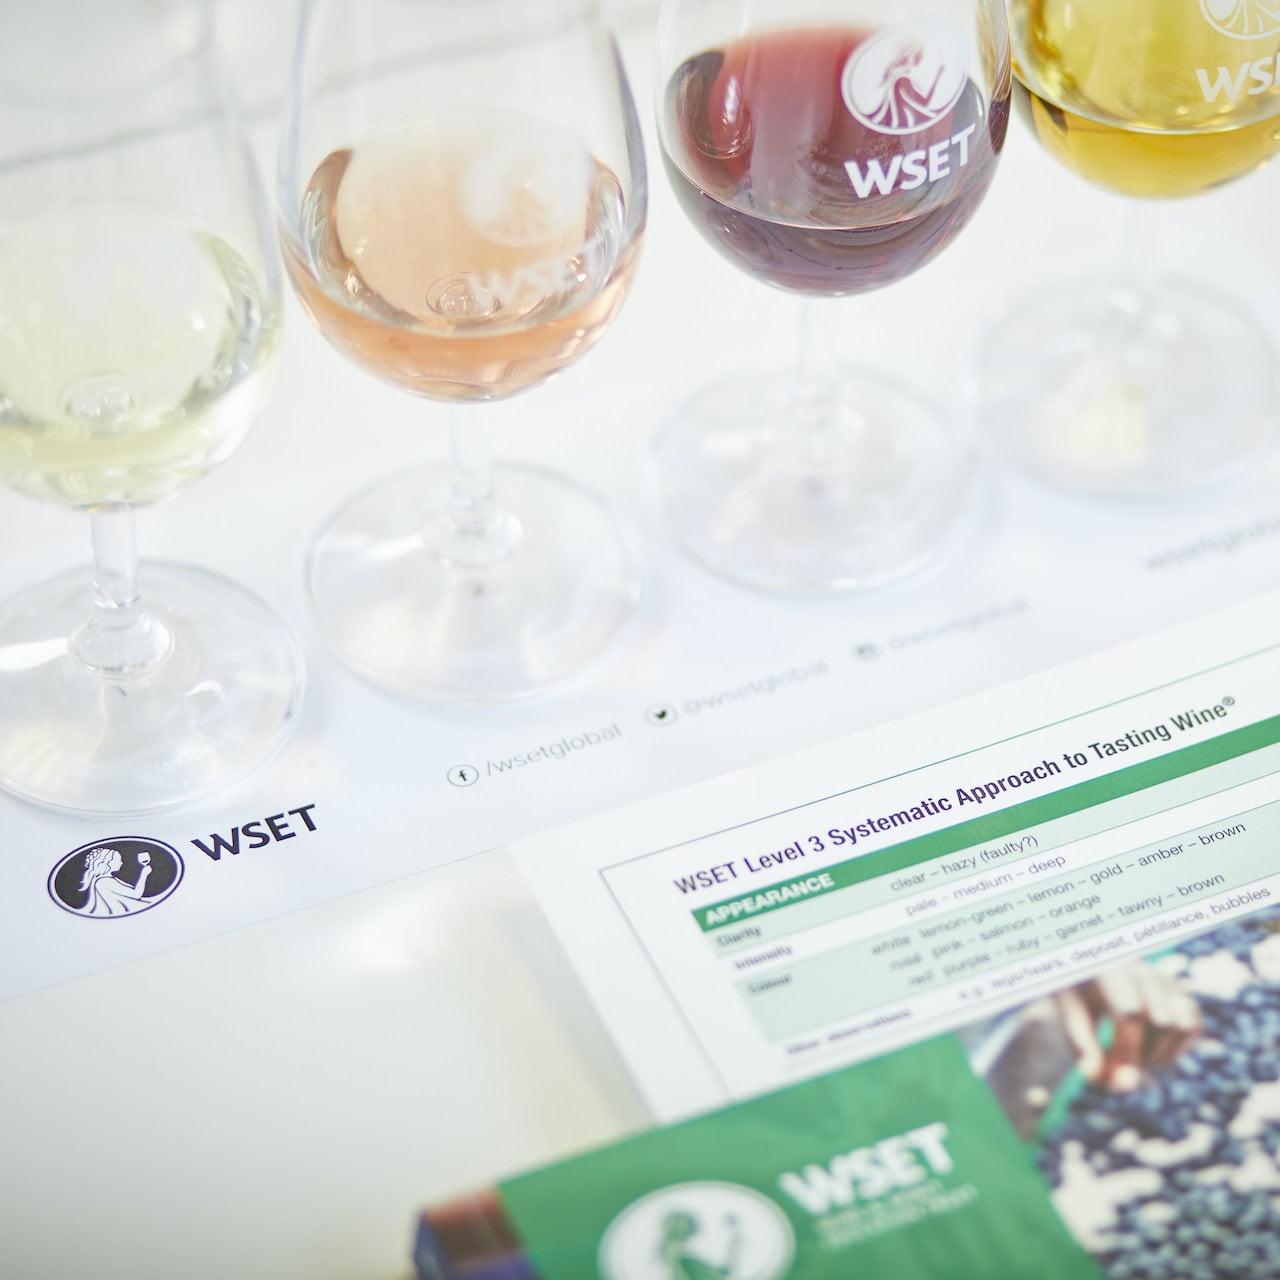 WSET online courses